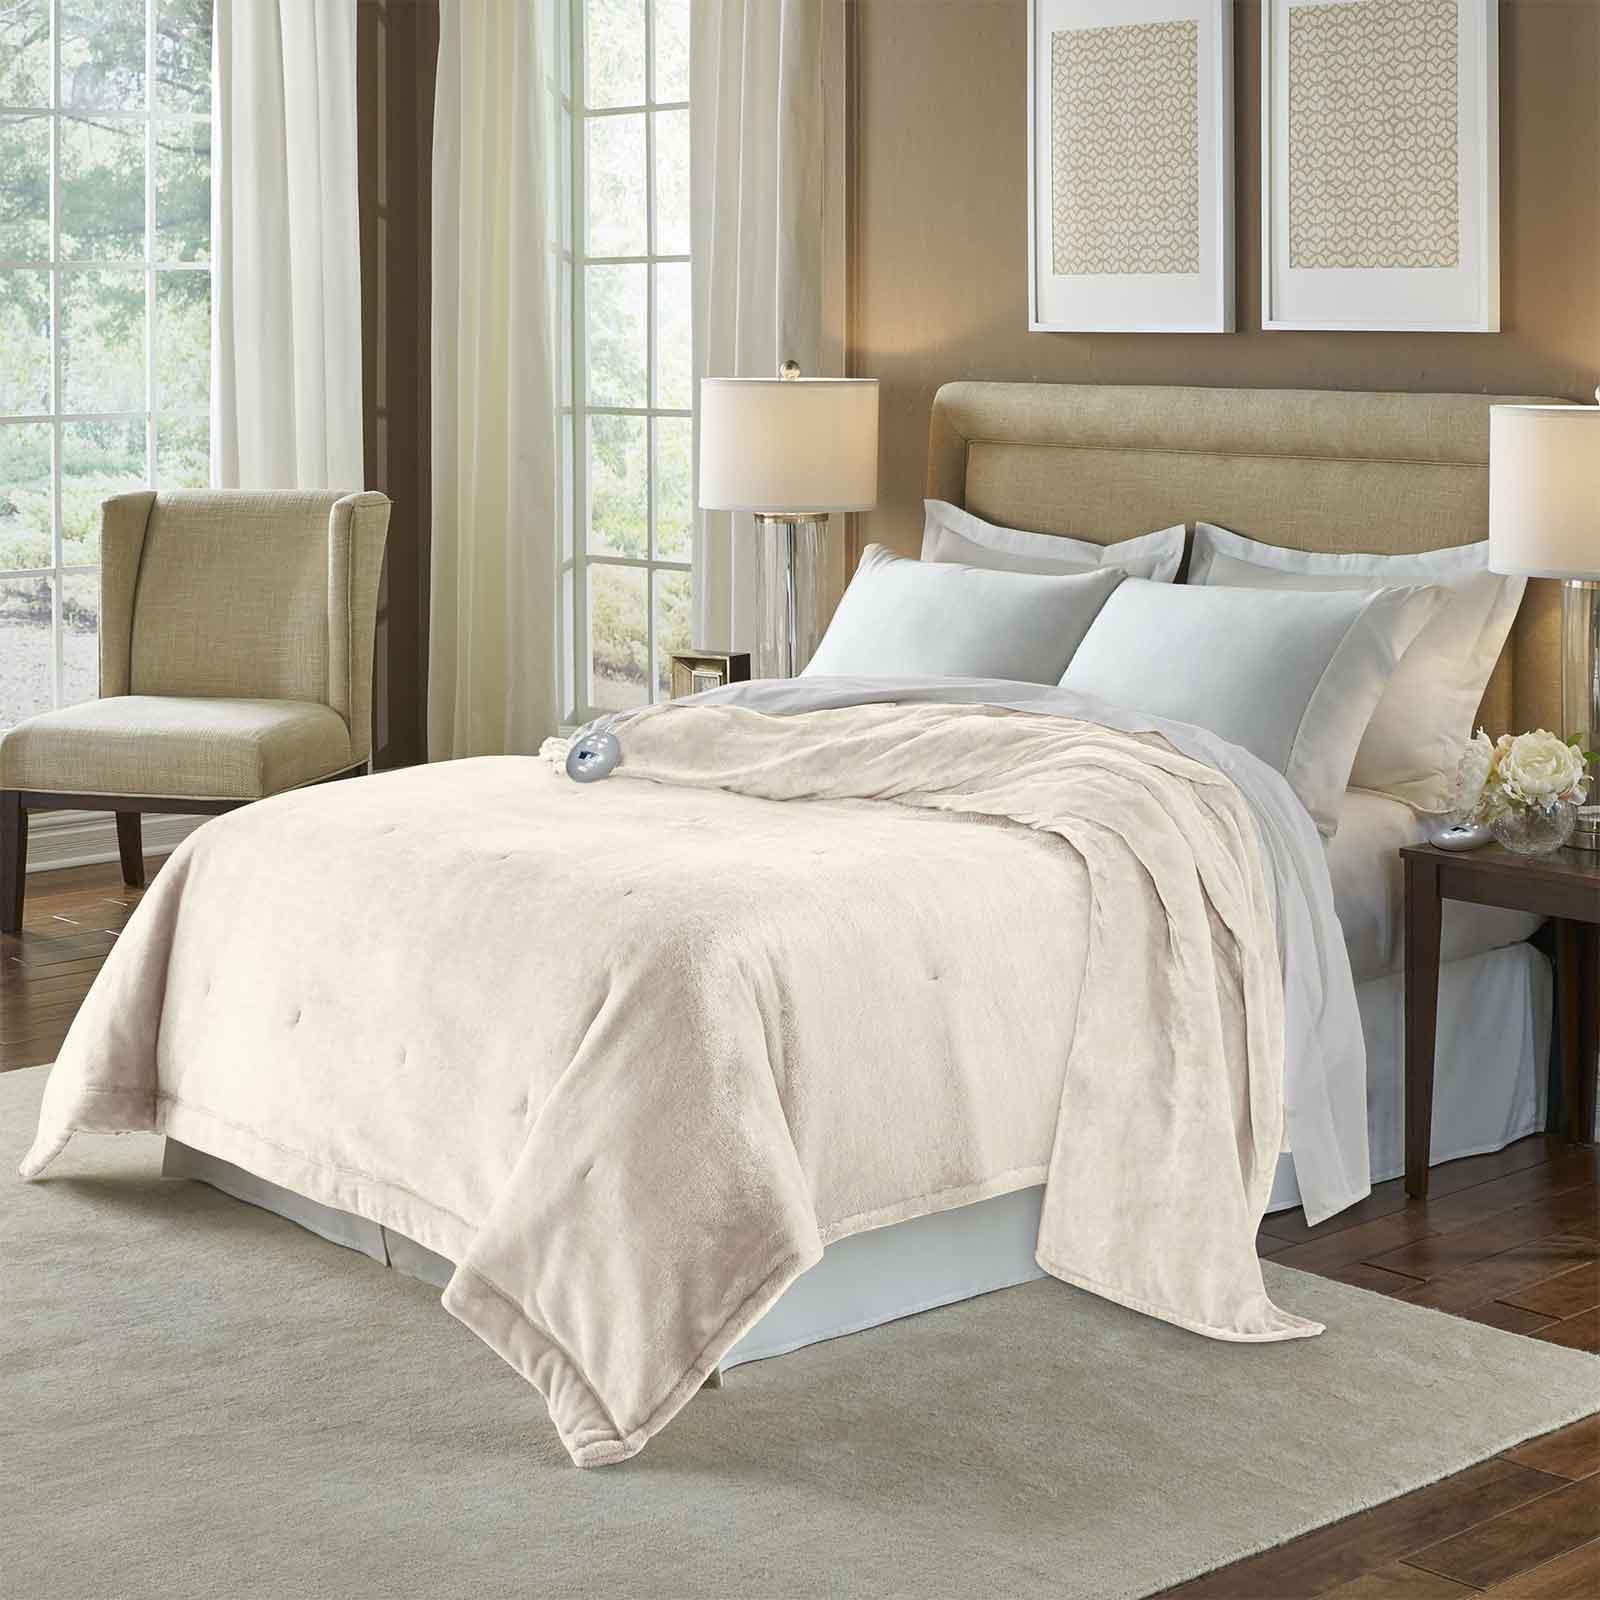 Soft Heat Velvet Plush Electric Blanket, Twin, Natural Vanilla